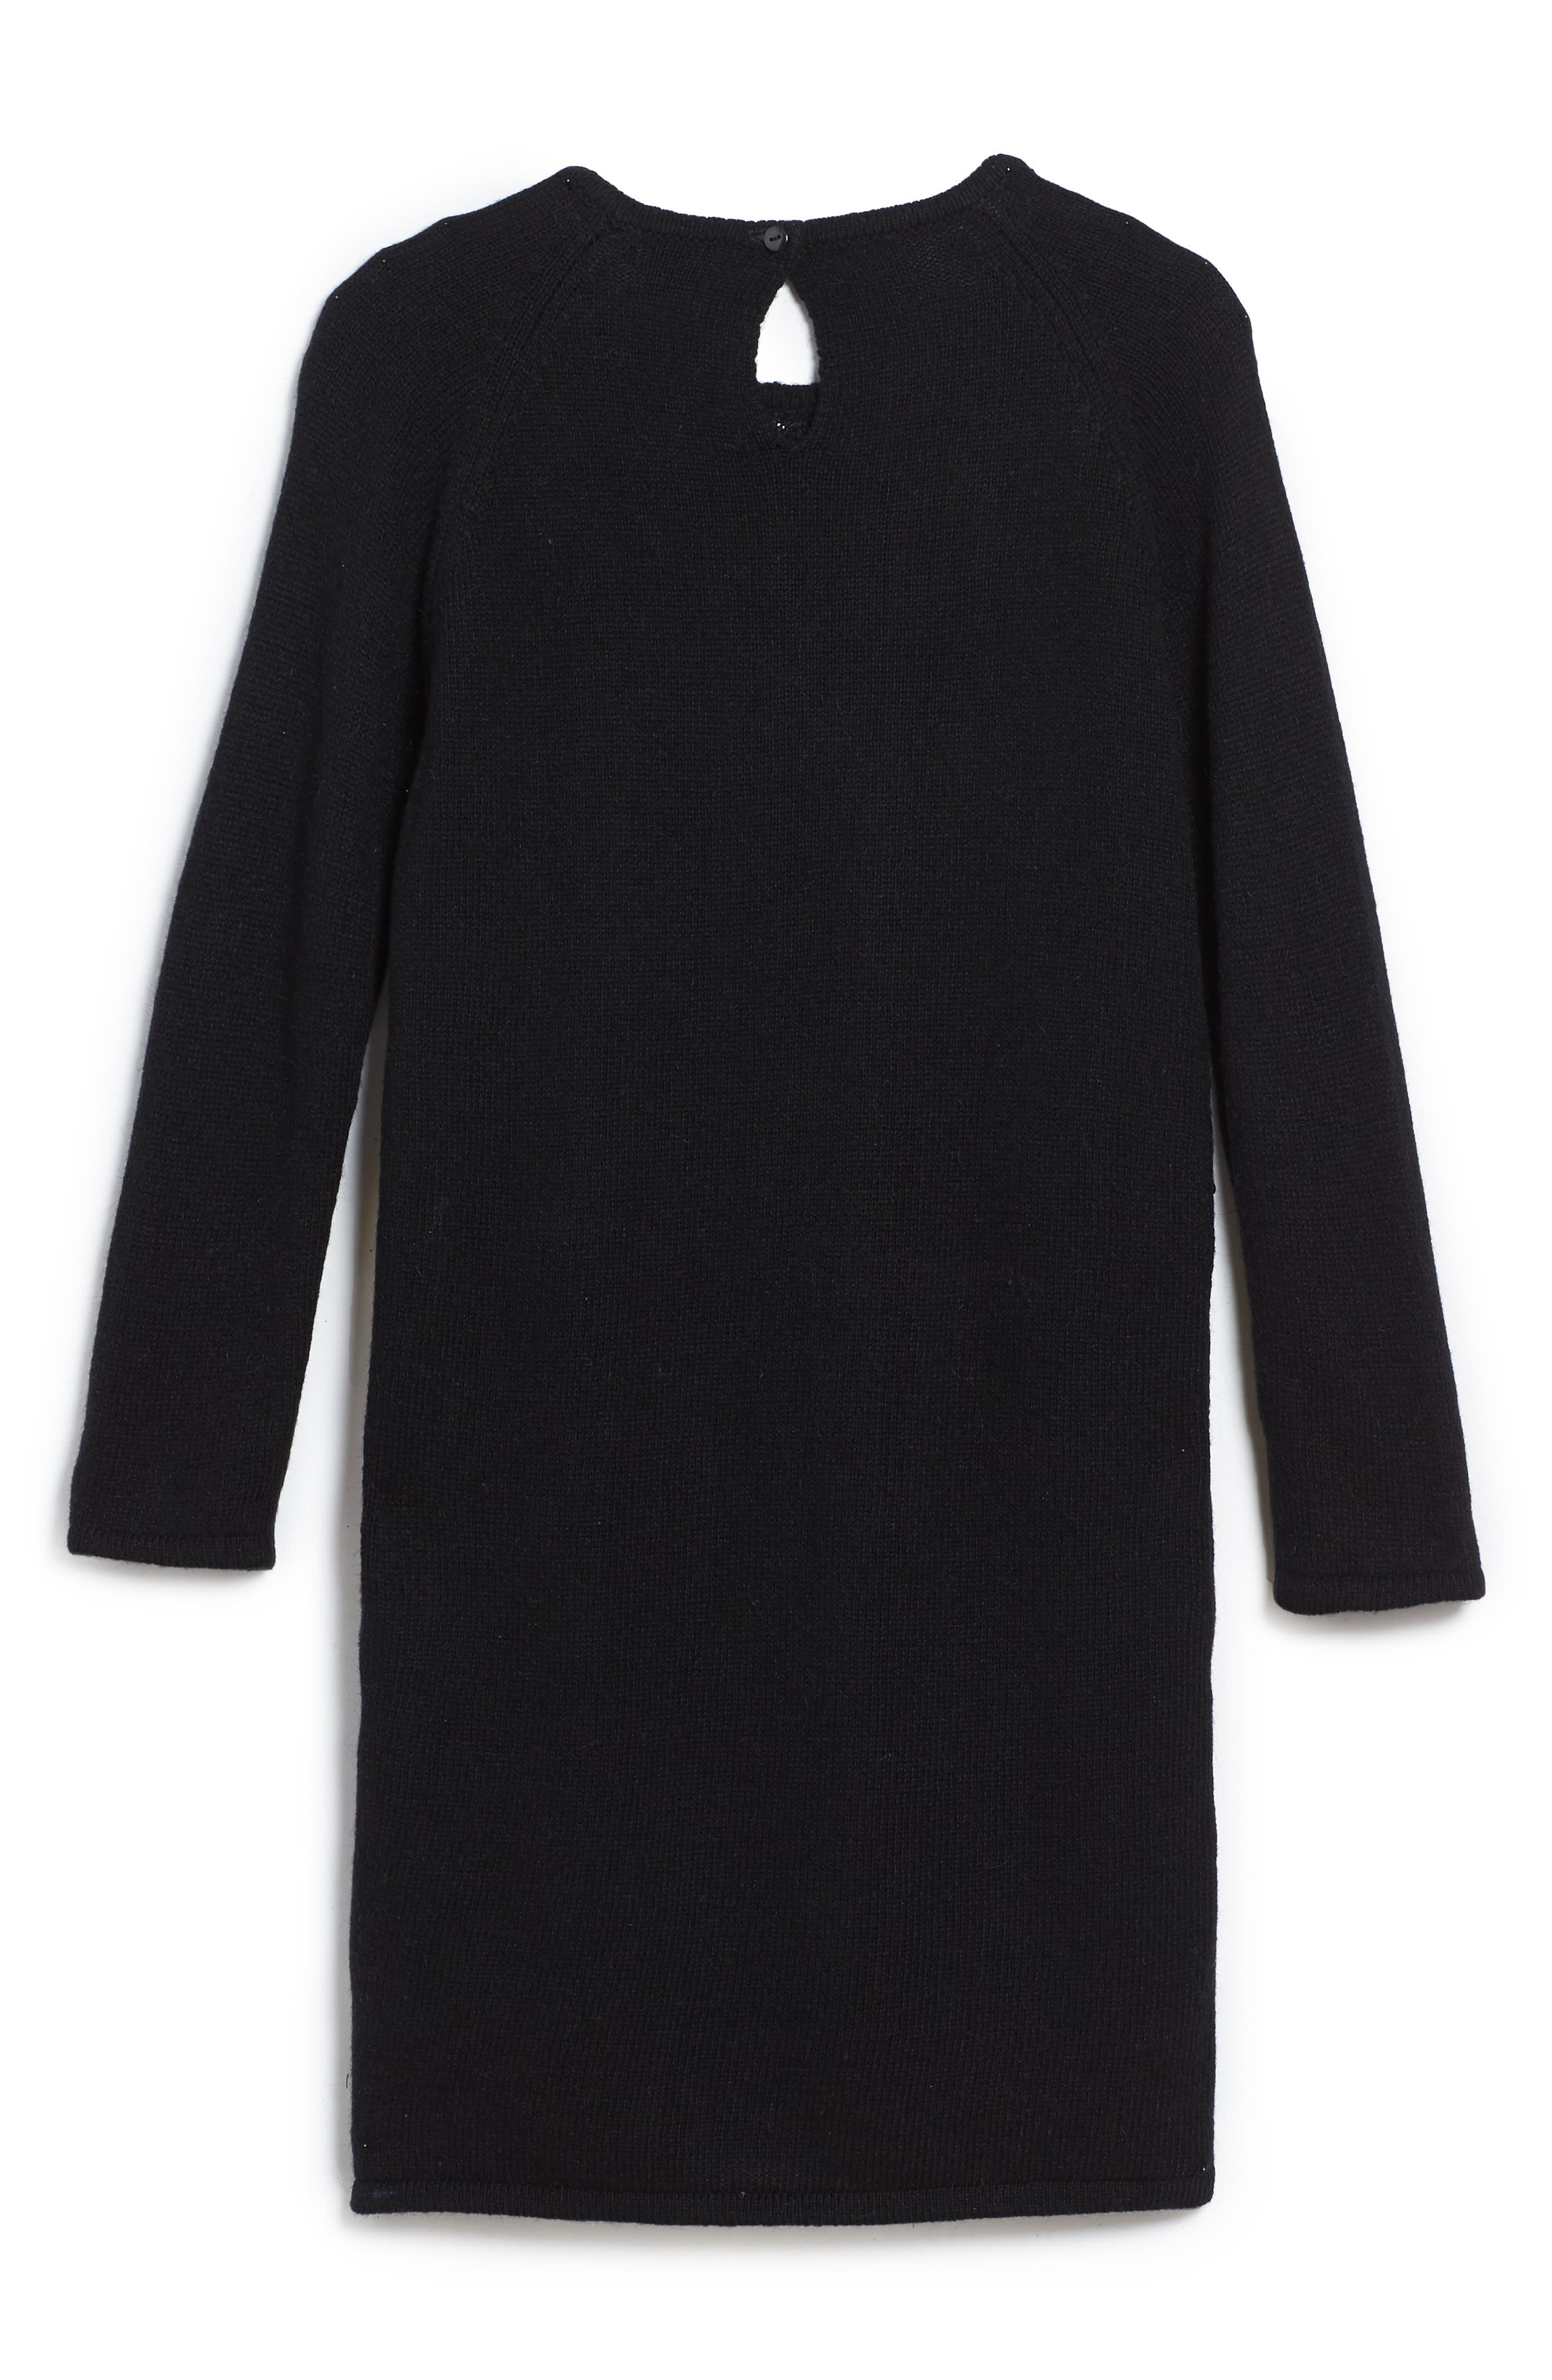 Alternate Image 2  - Marciano Chevron Sequin Sweater Dress (Big Girls)